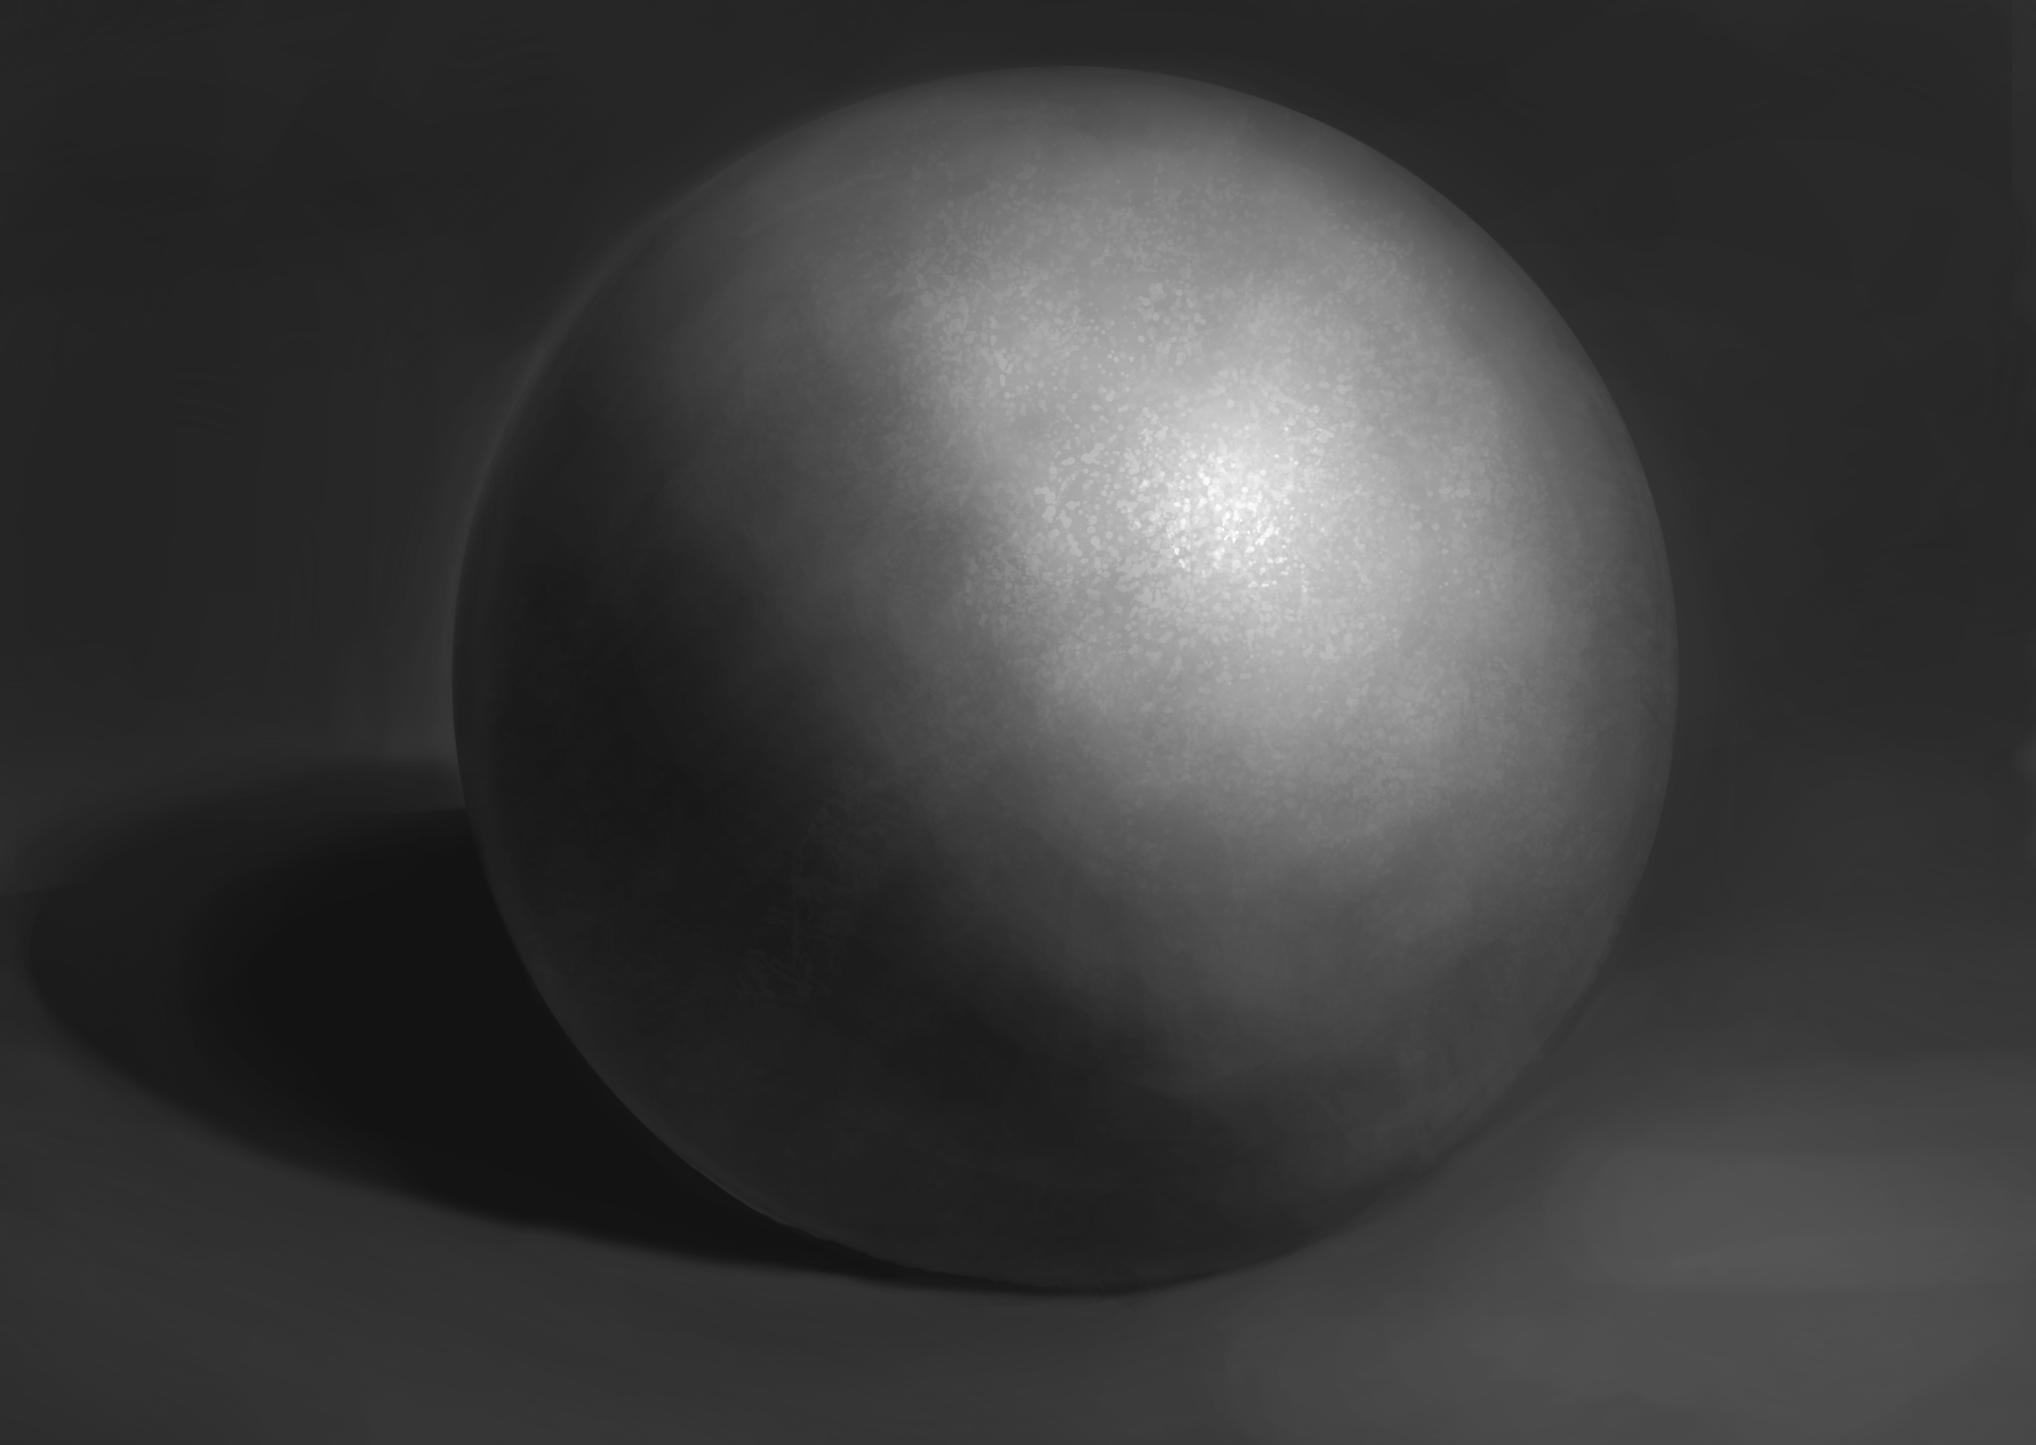 study-ball_2-10-2015